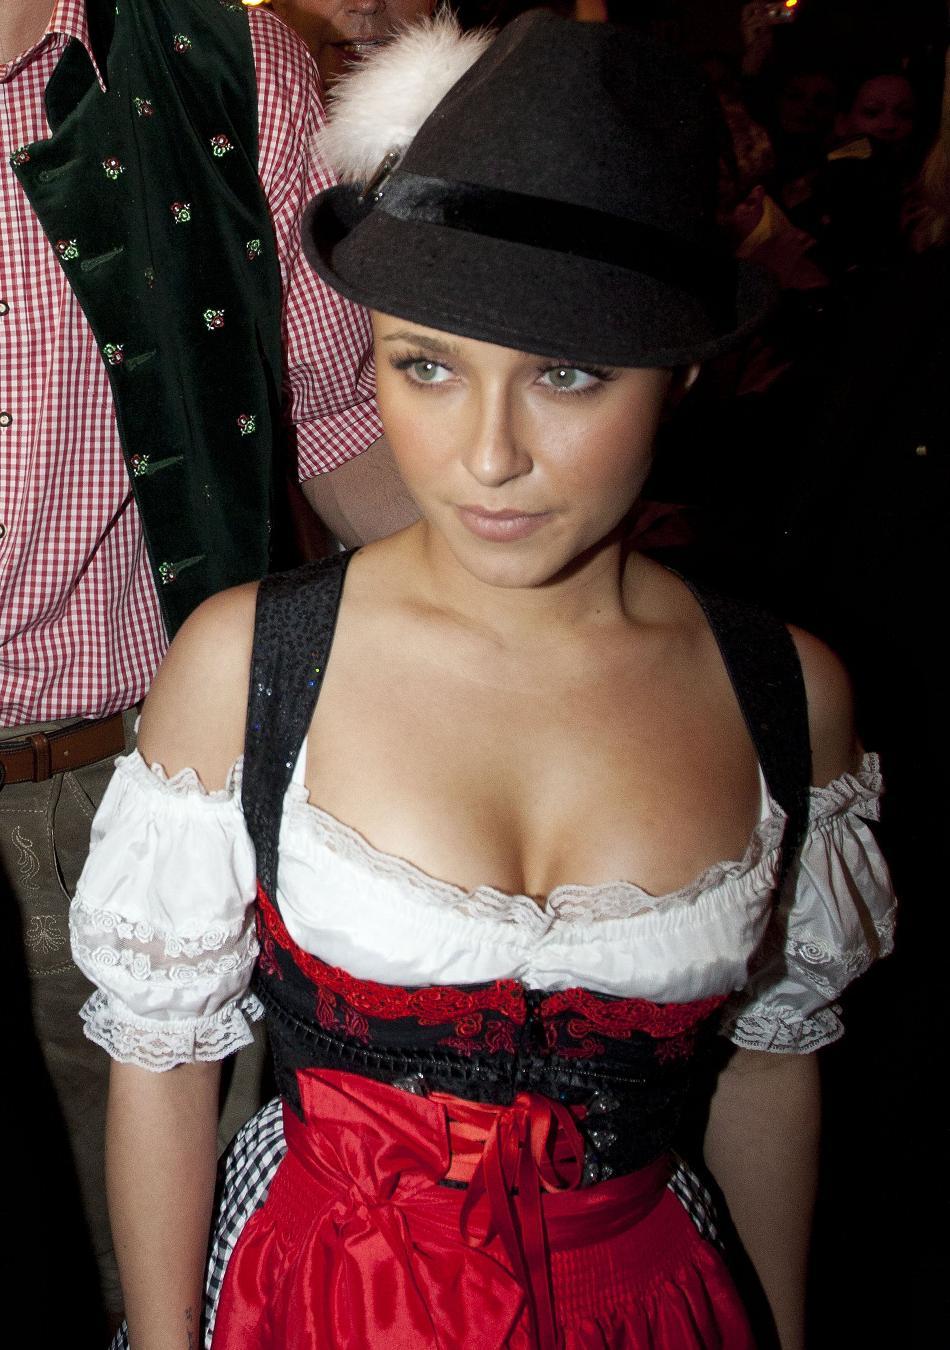 Oktoberfest orgy with busty milf - 3 part 4